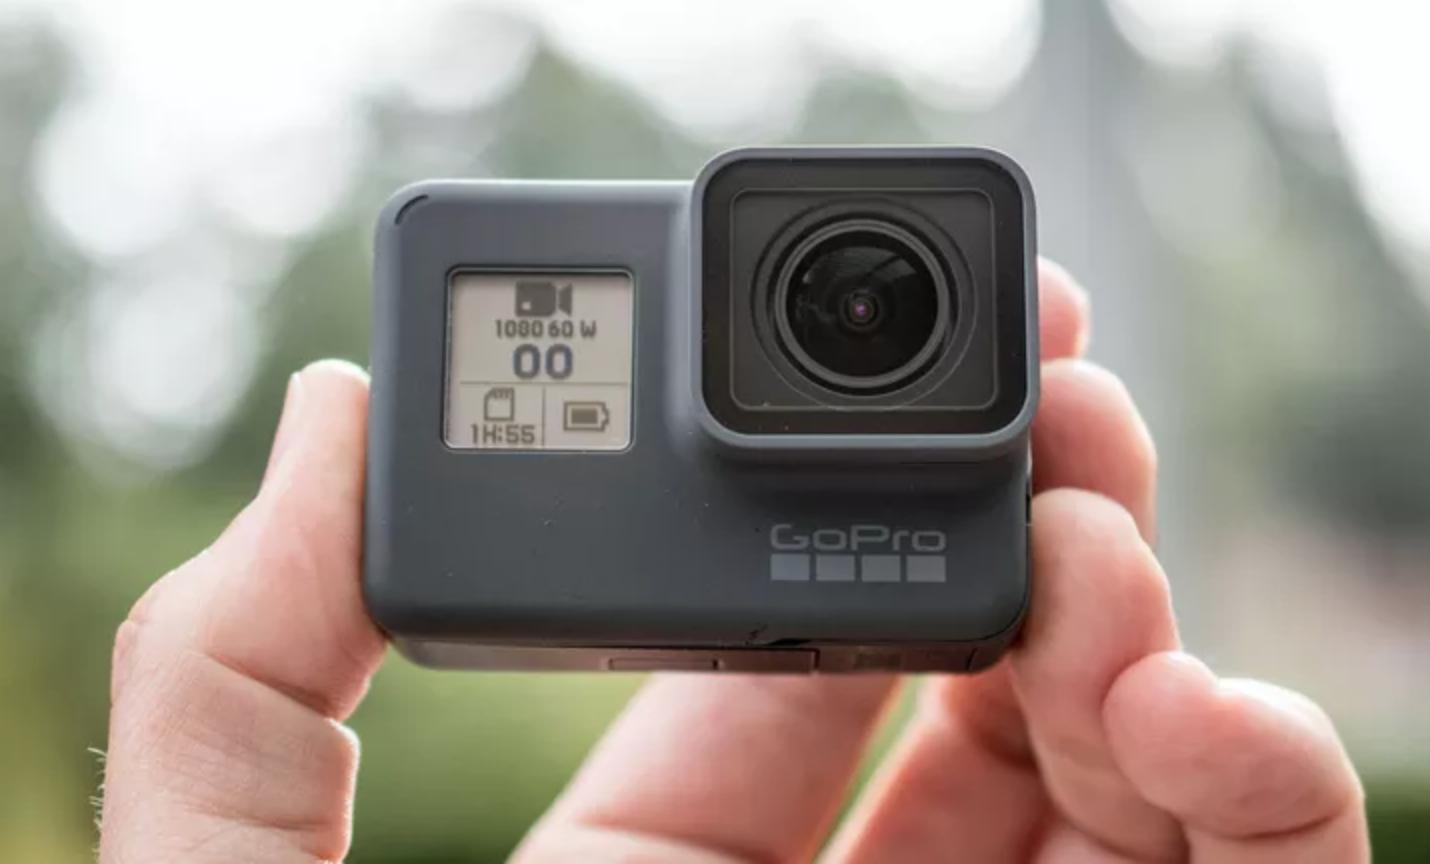 GoProをレンタルする時のポイントとオススメのレンタルサイト3選